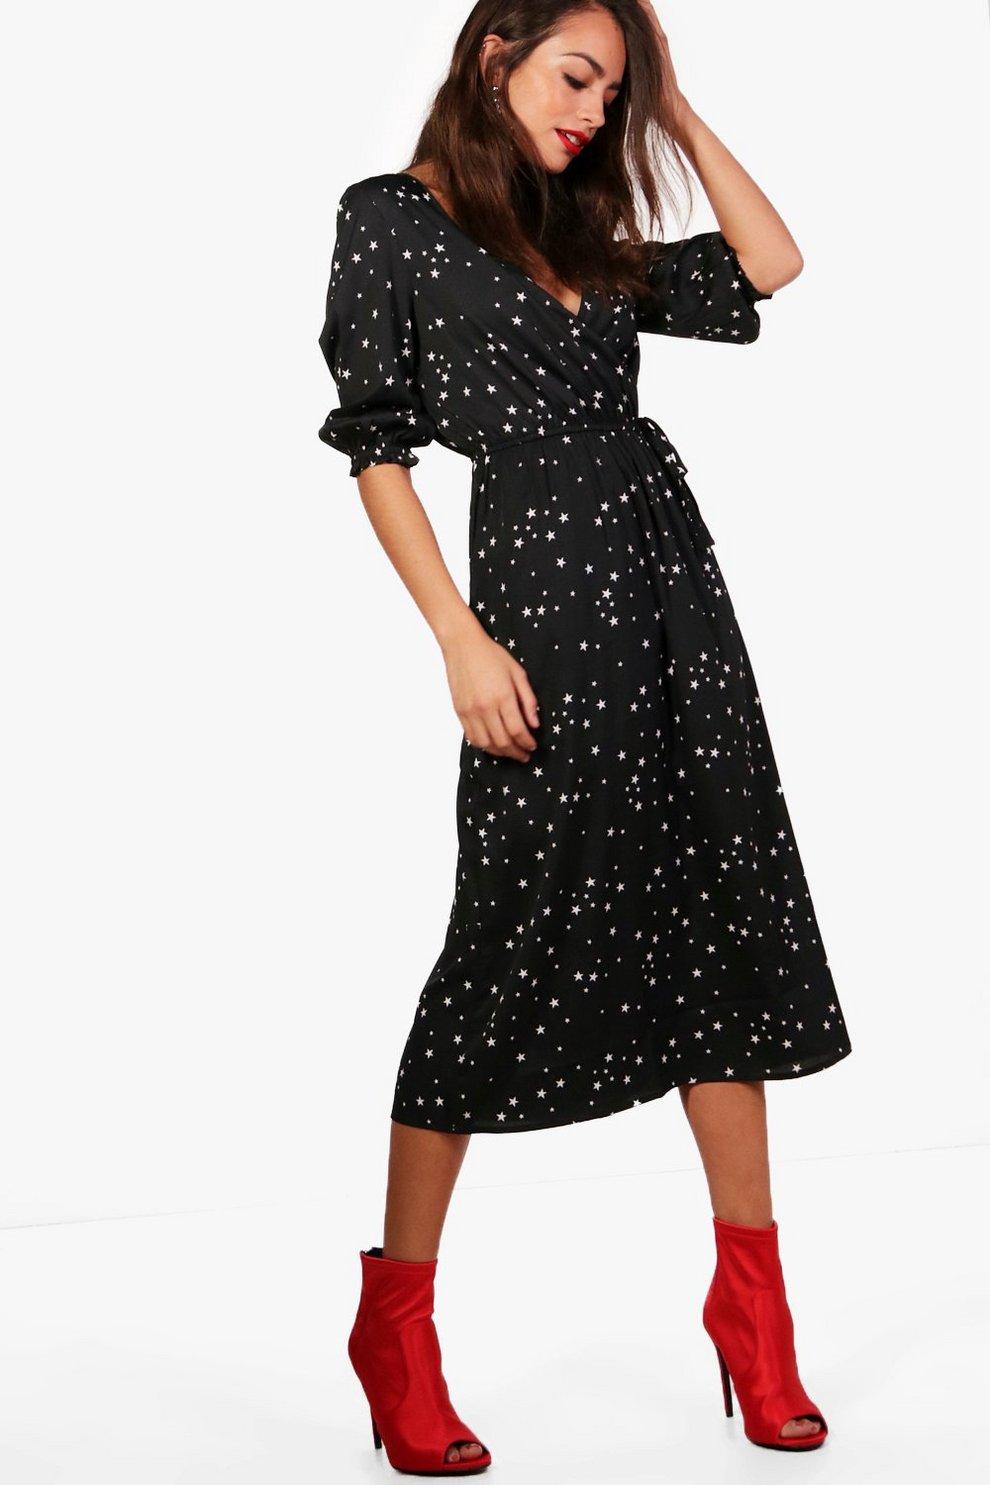 Becci Star Print Wrap Midi Skater Dress  2fd3da546